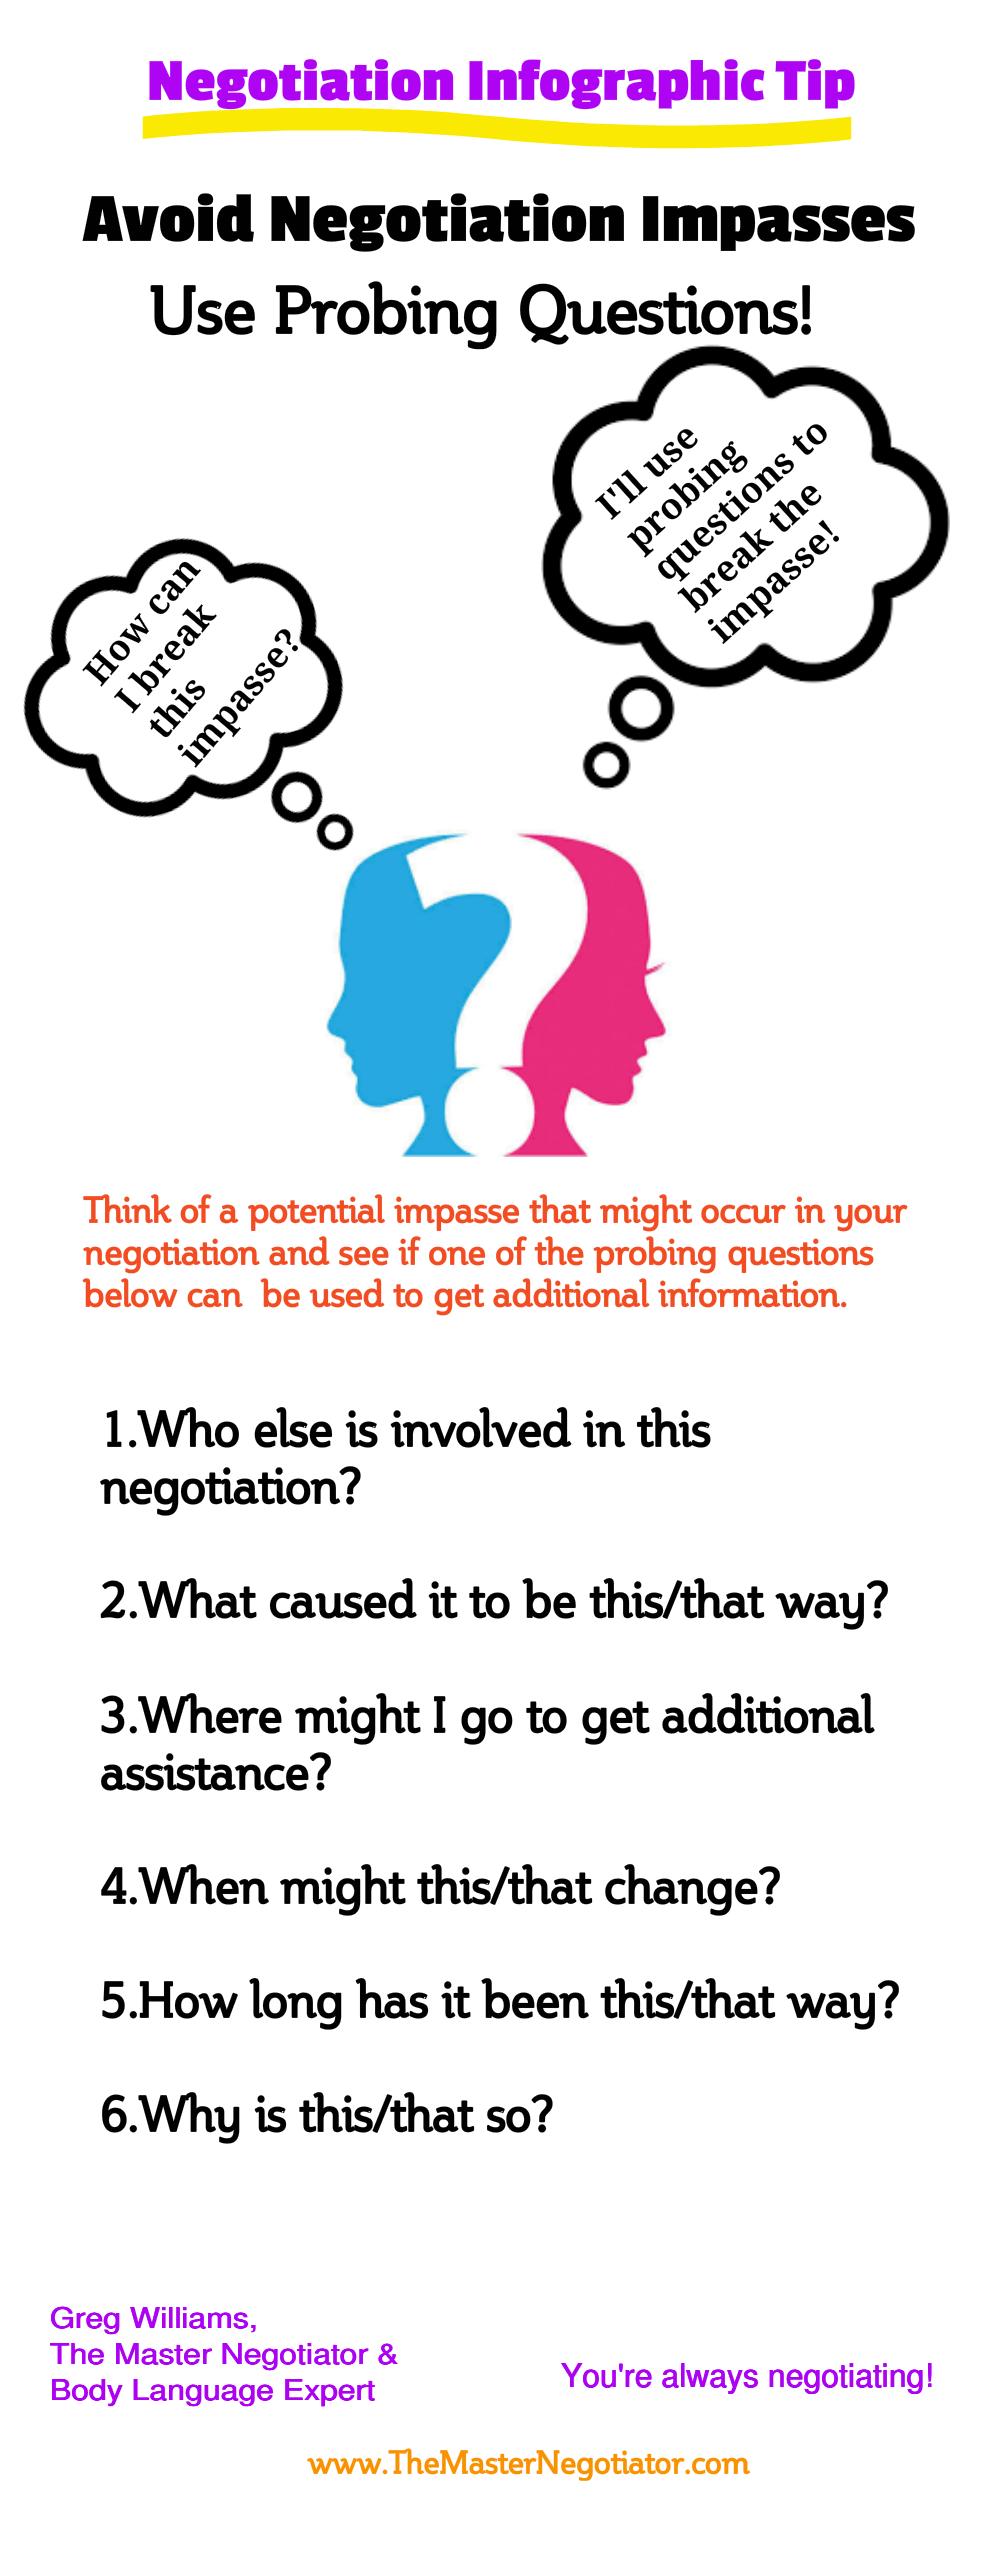 Avoid Negotiation Impasses